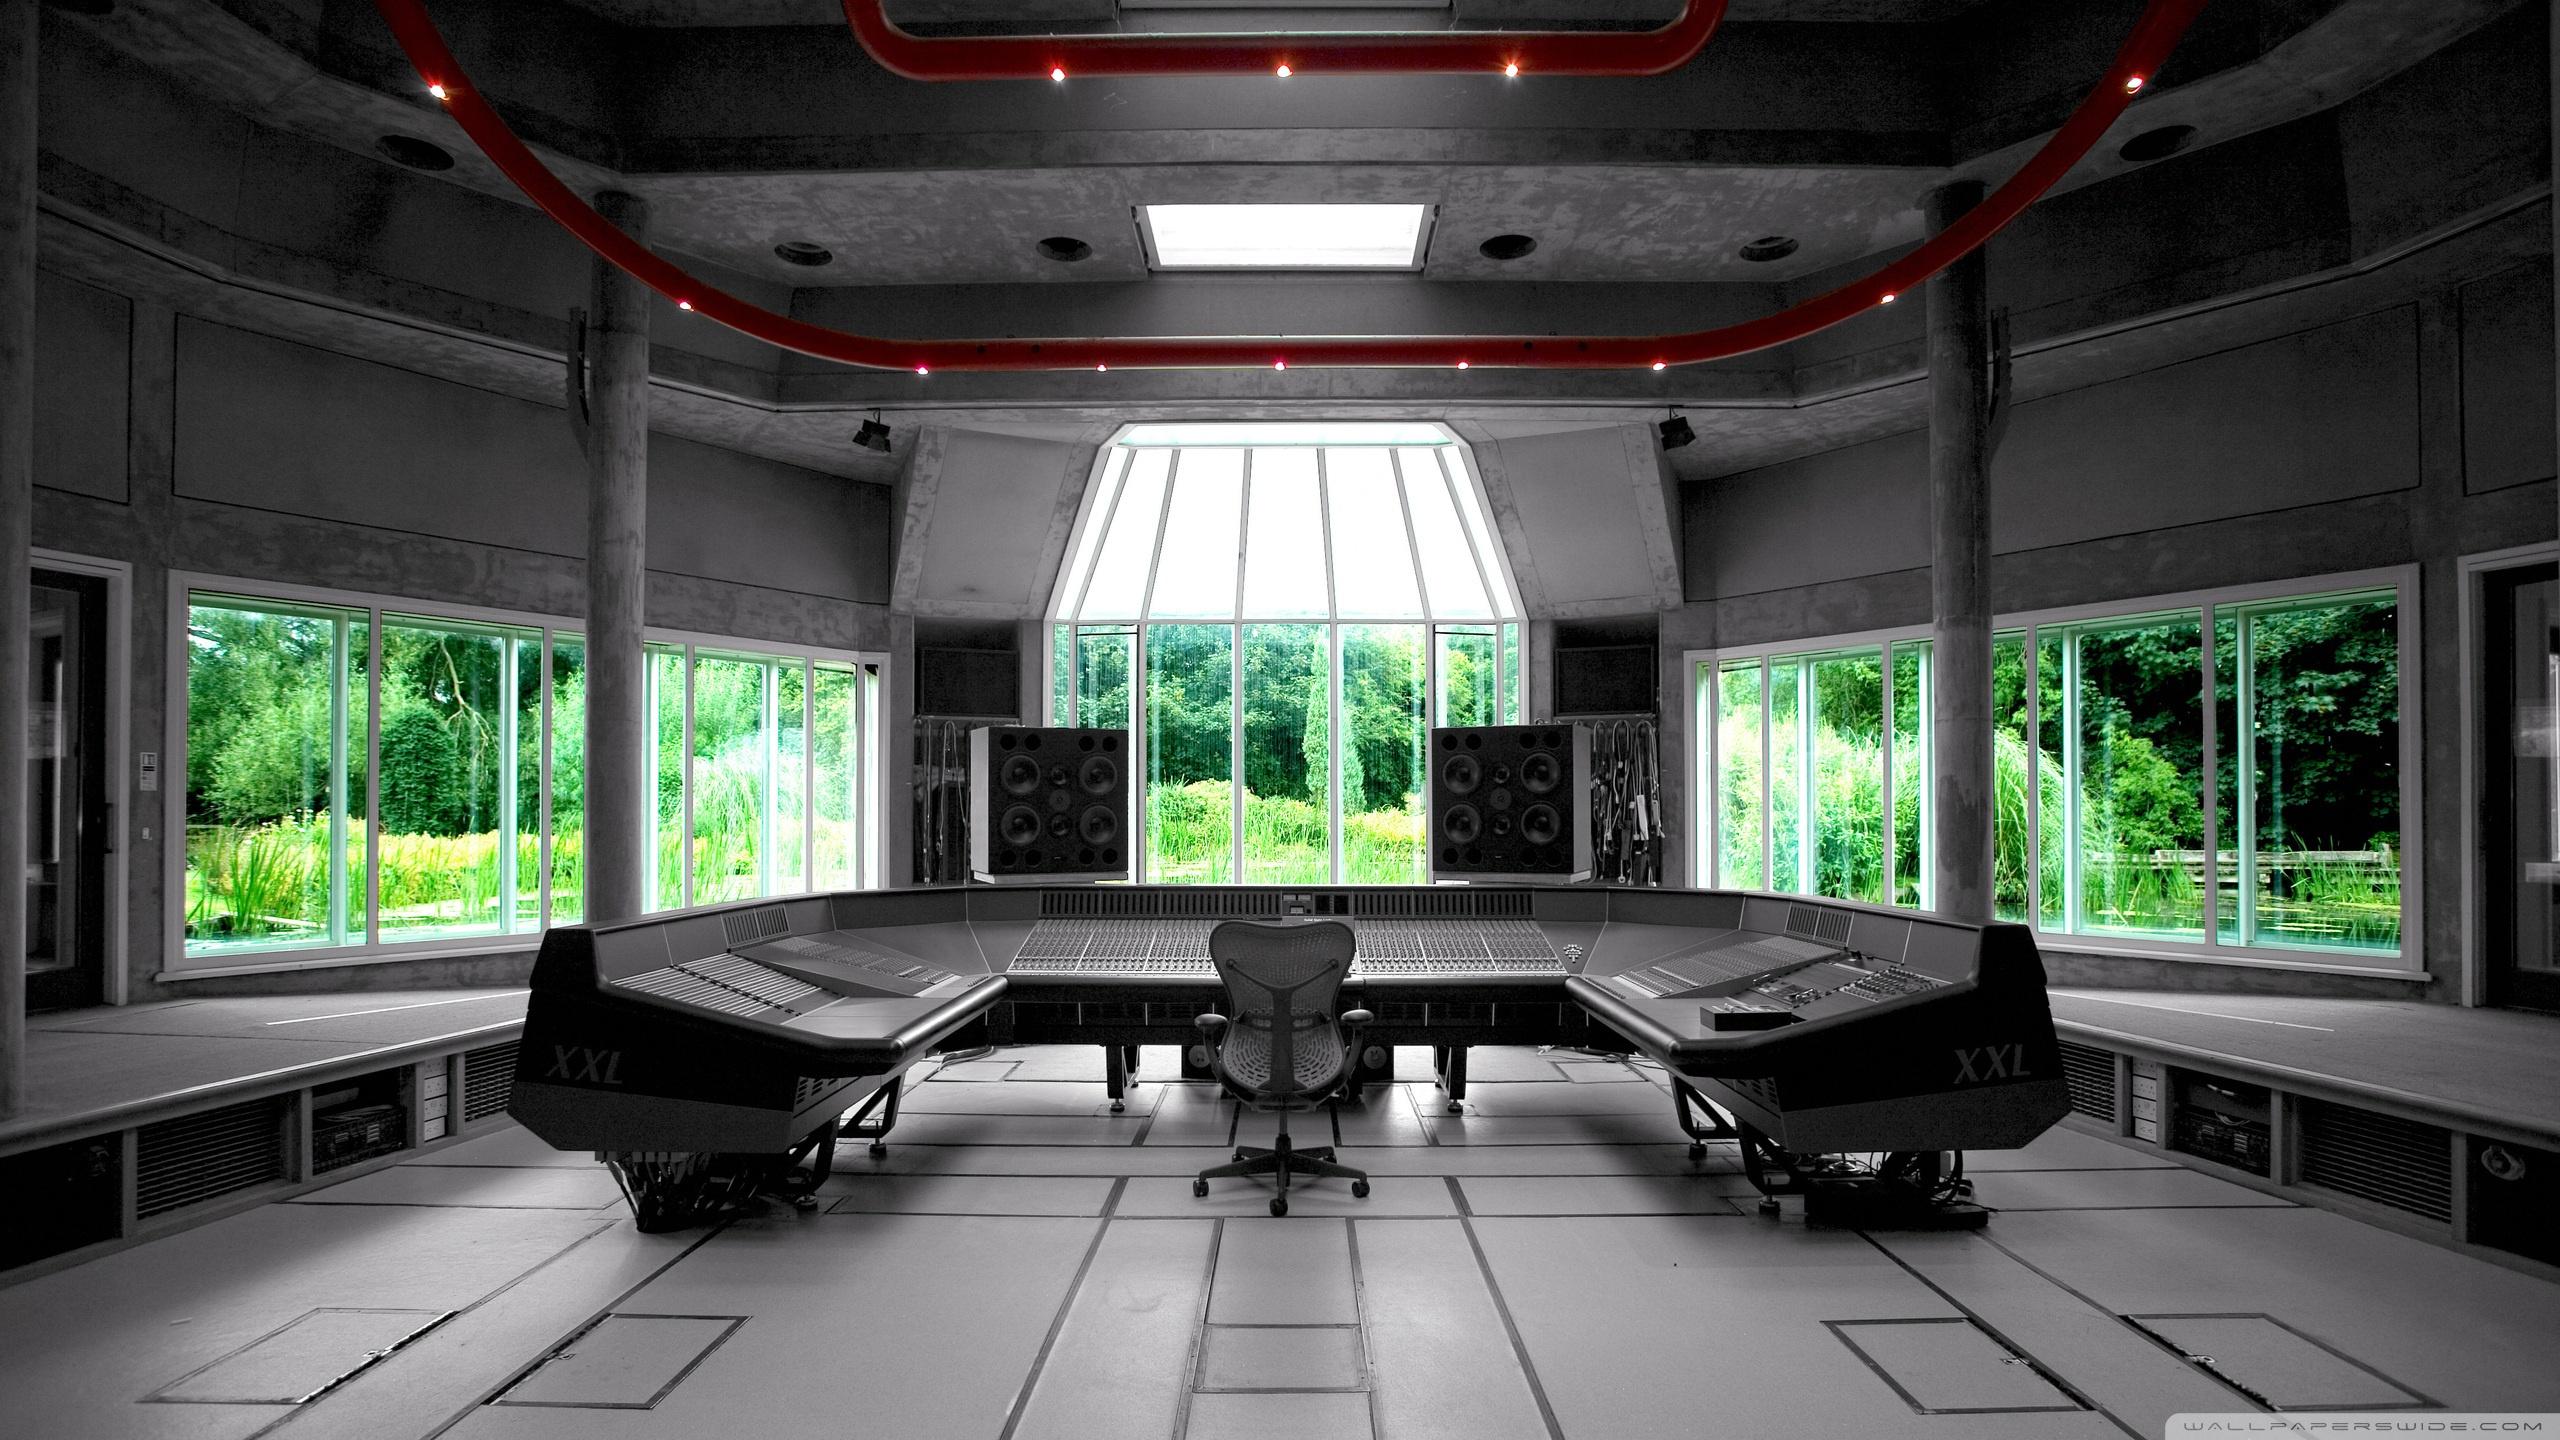 Music Recording Studio 4K HD Desktop Wallpaper for 4K Ultra HD 2560x1440